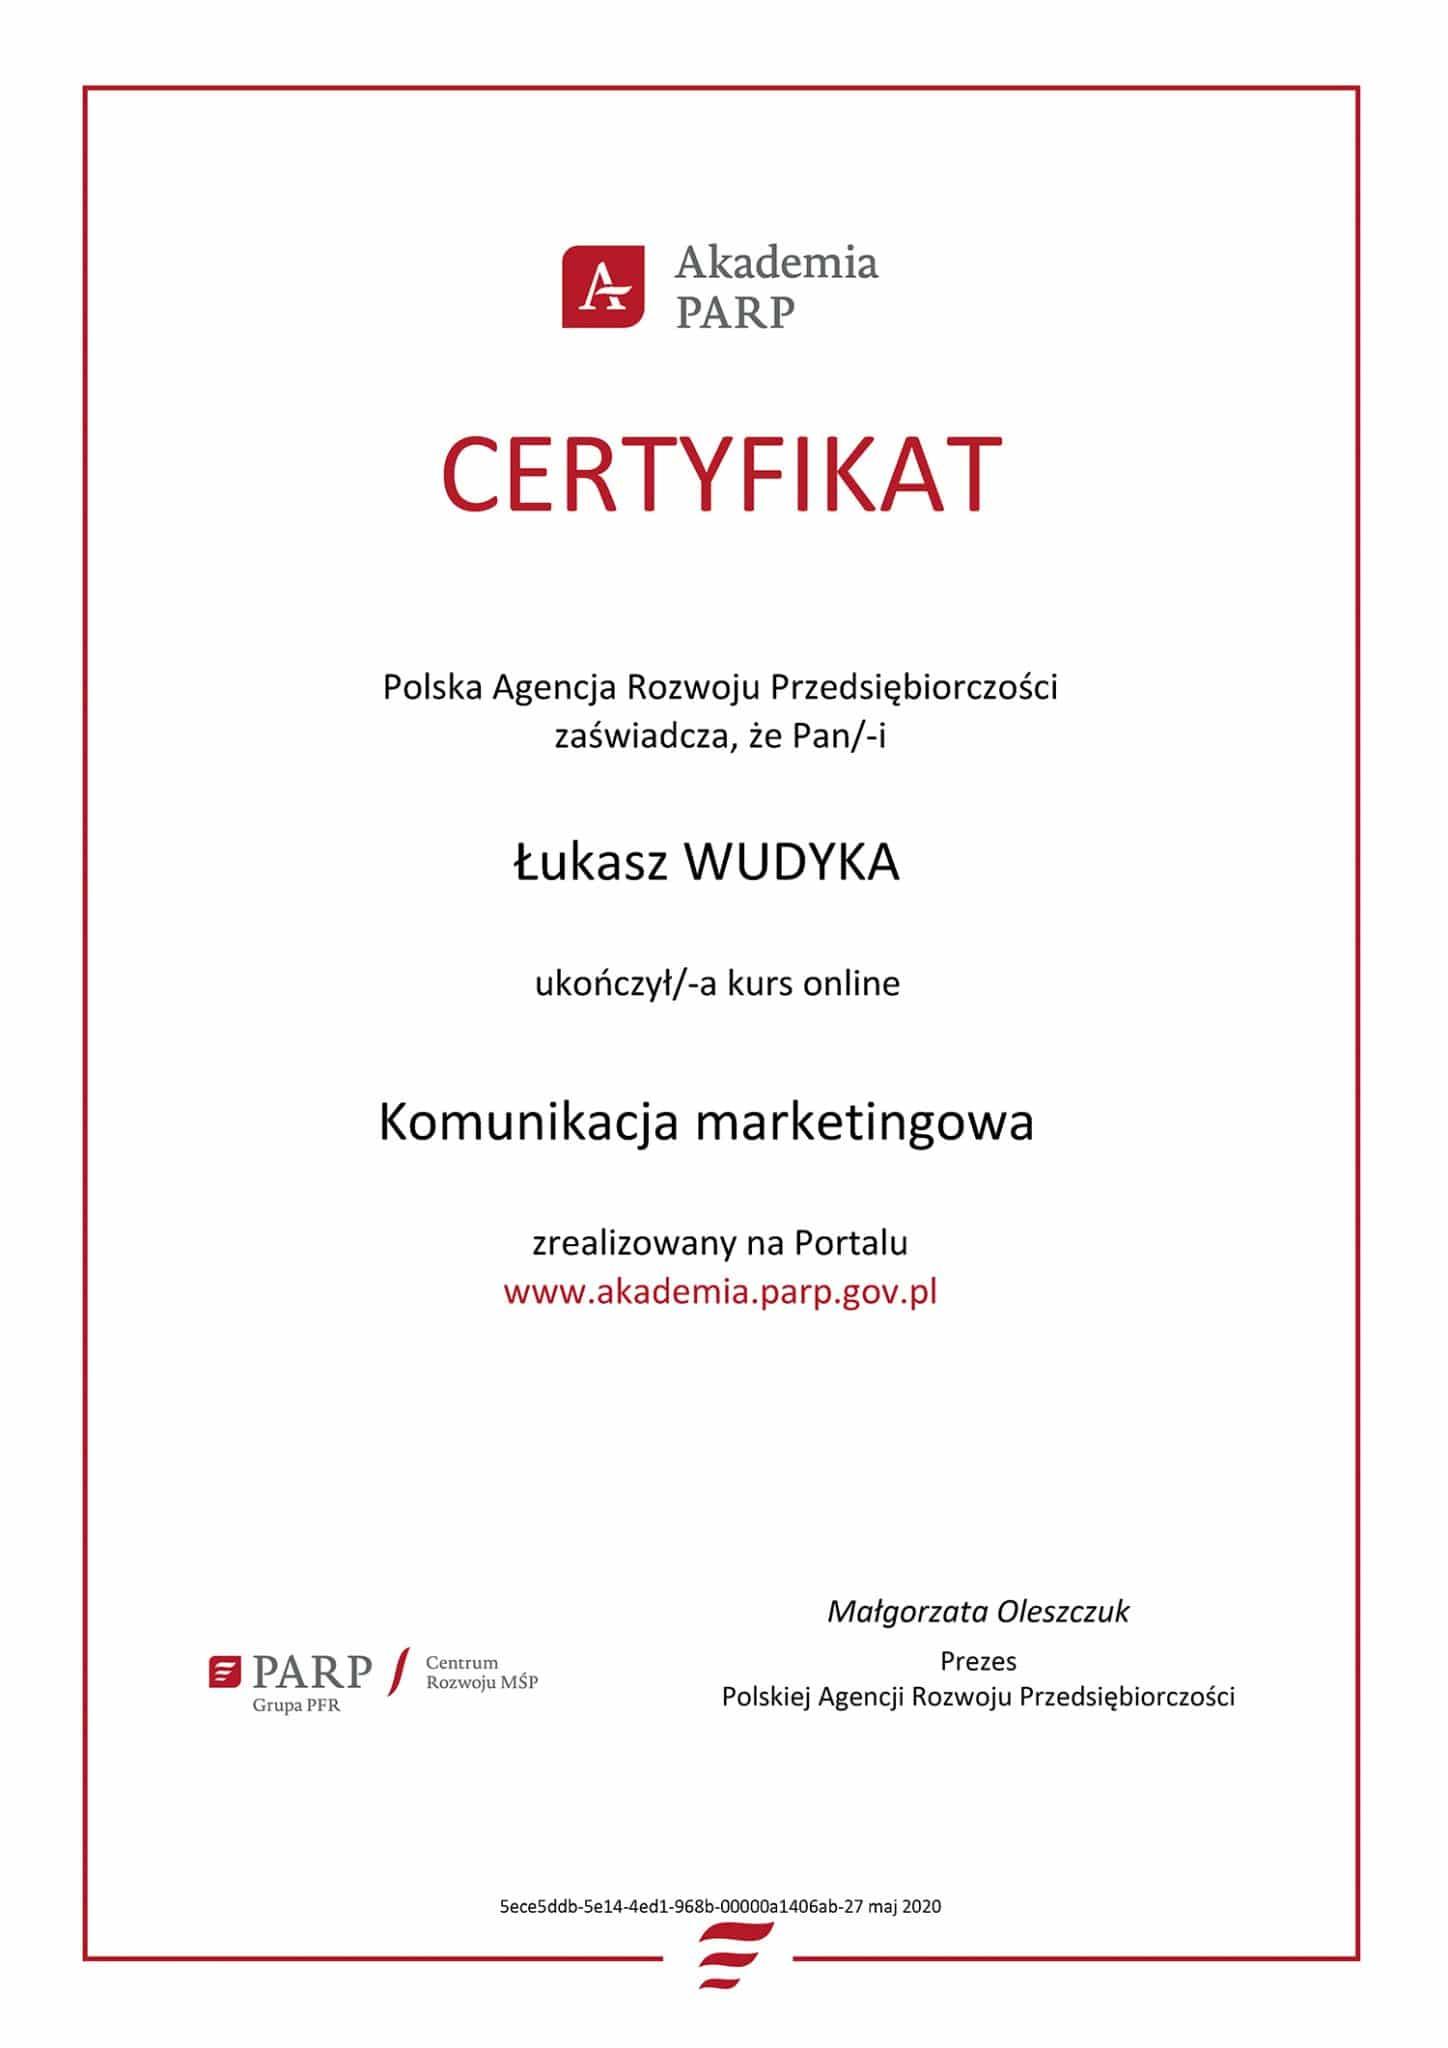 Certyfikat PARP komunikacja marketingowa